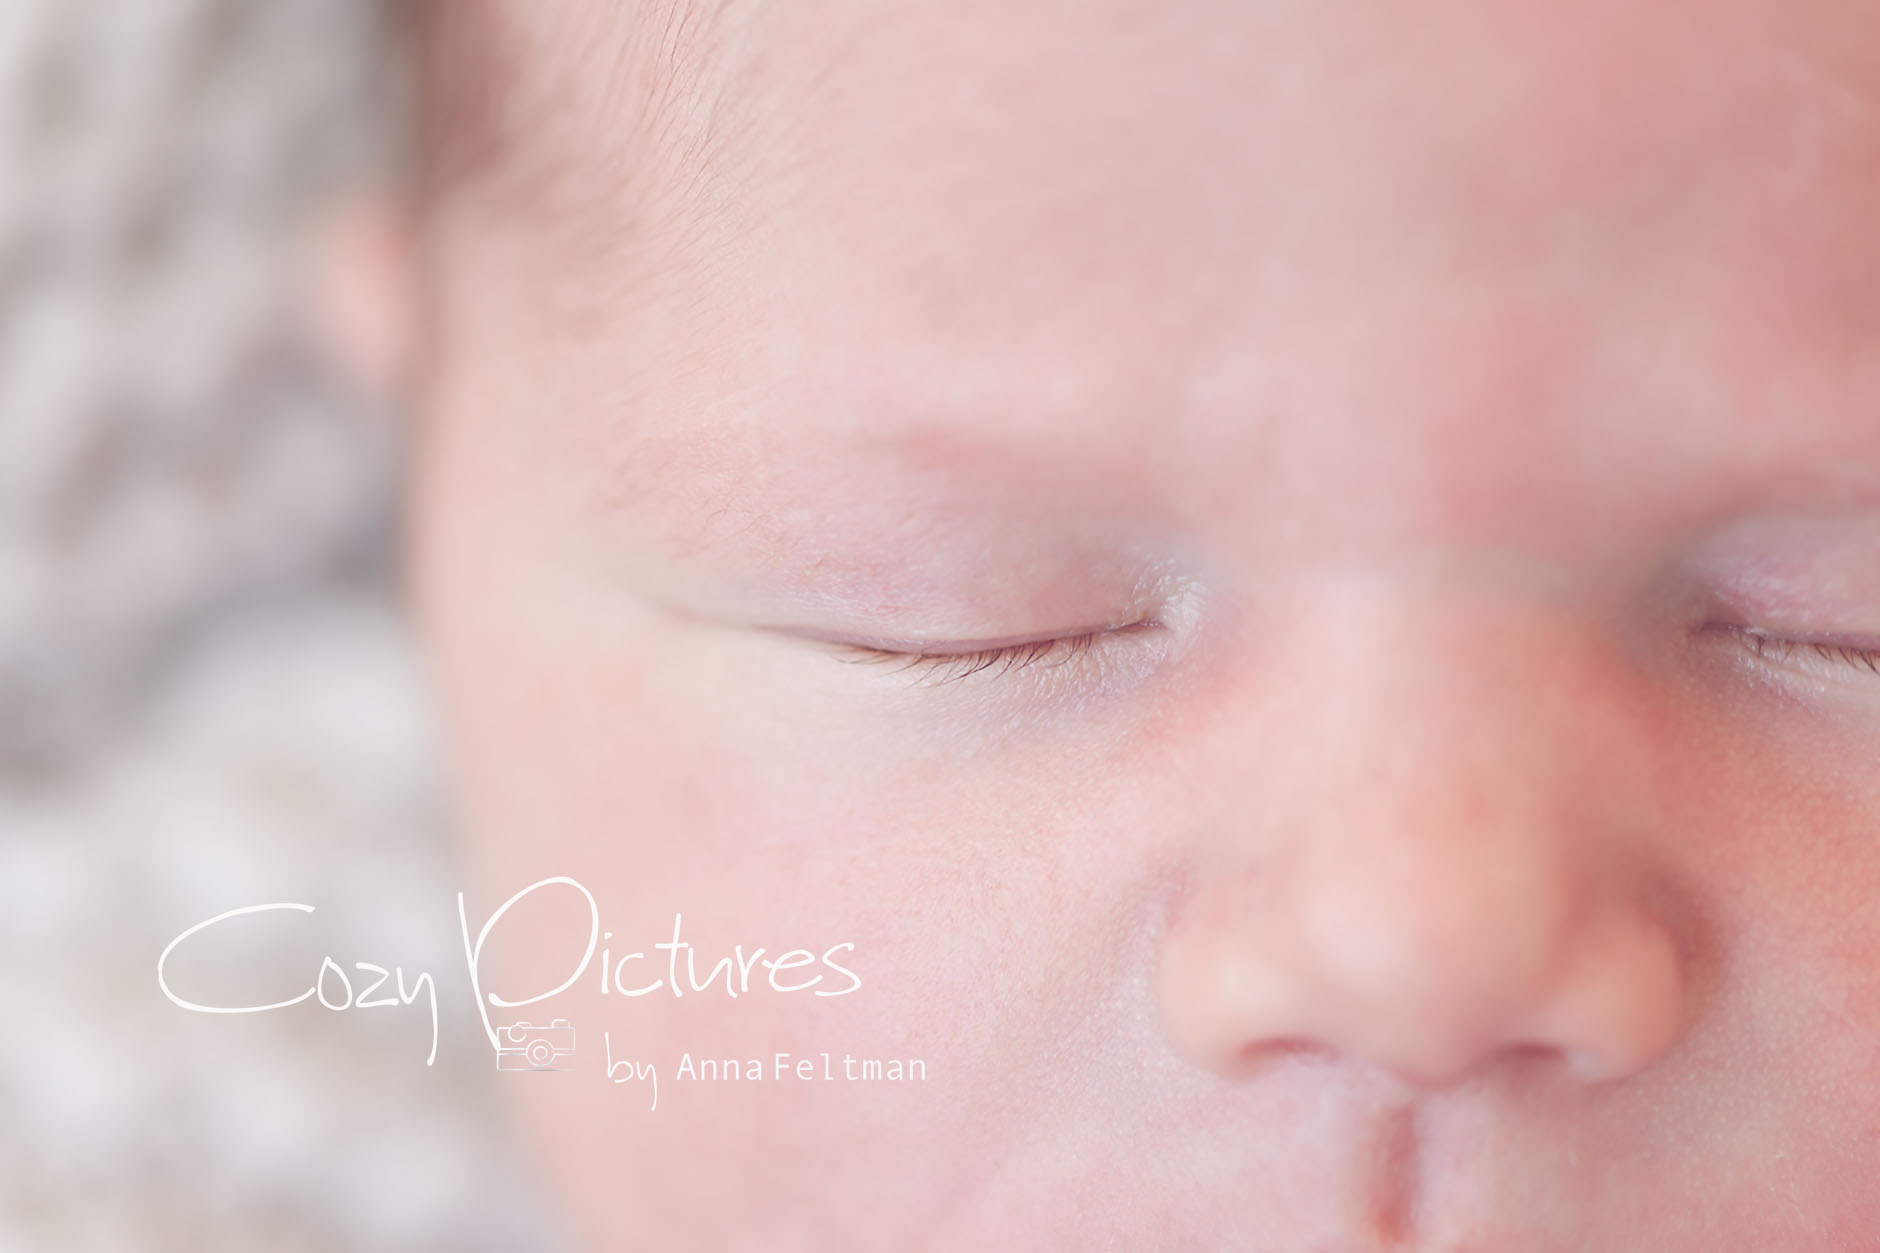 Newborn_Orlando_14_cozy_pictures.jpg